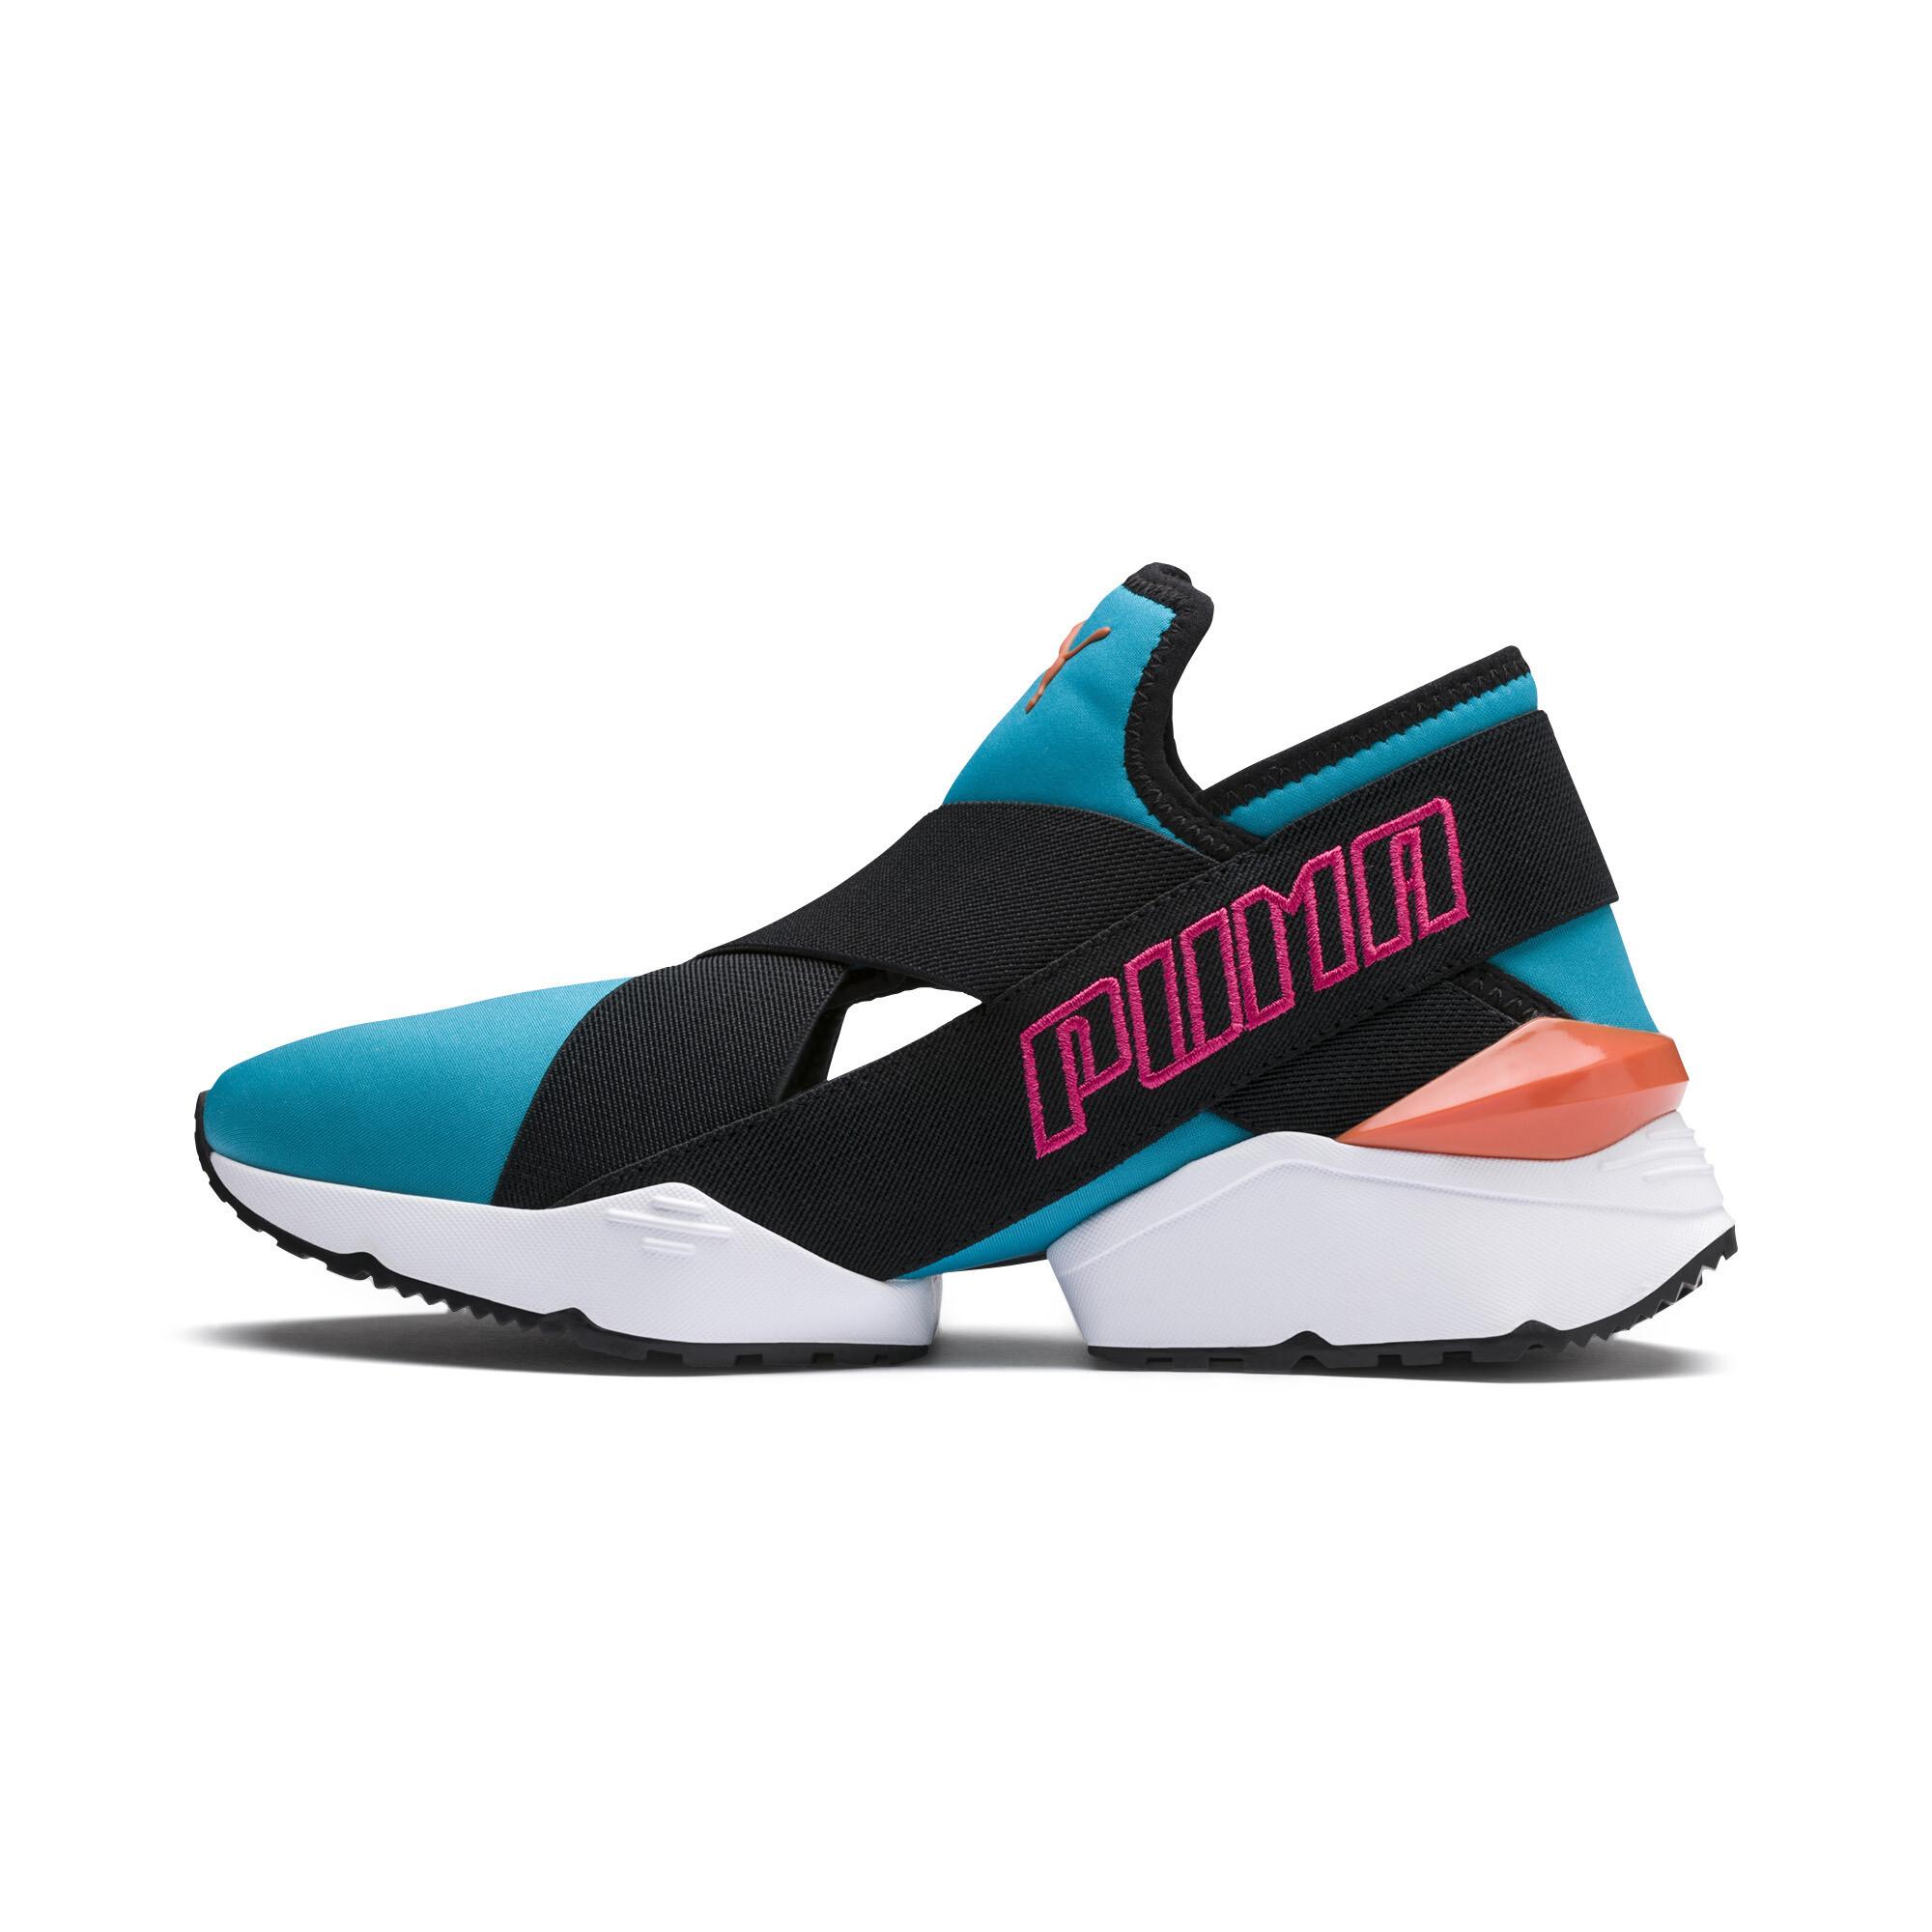 Image Puma Muse EOS 2 TZ Women's Sneakers #1